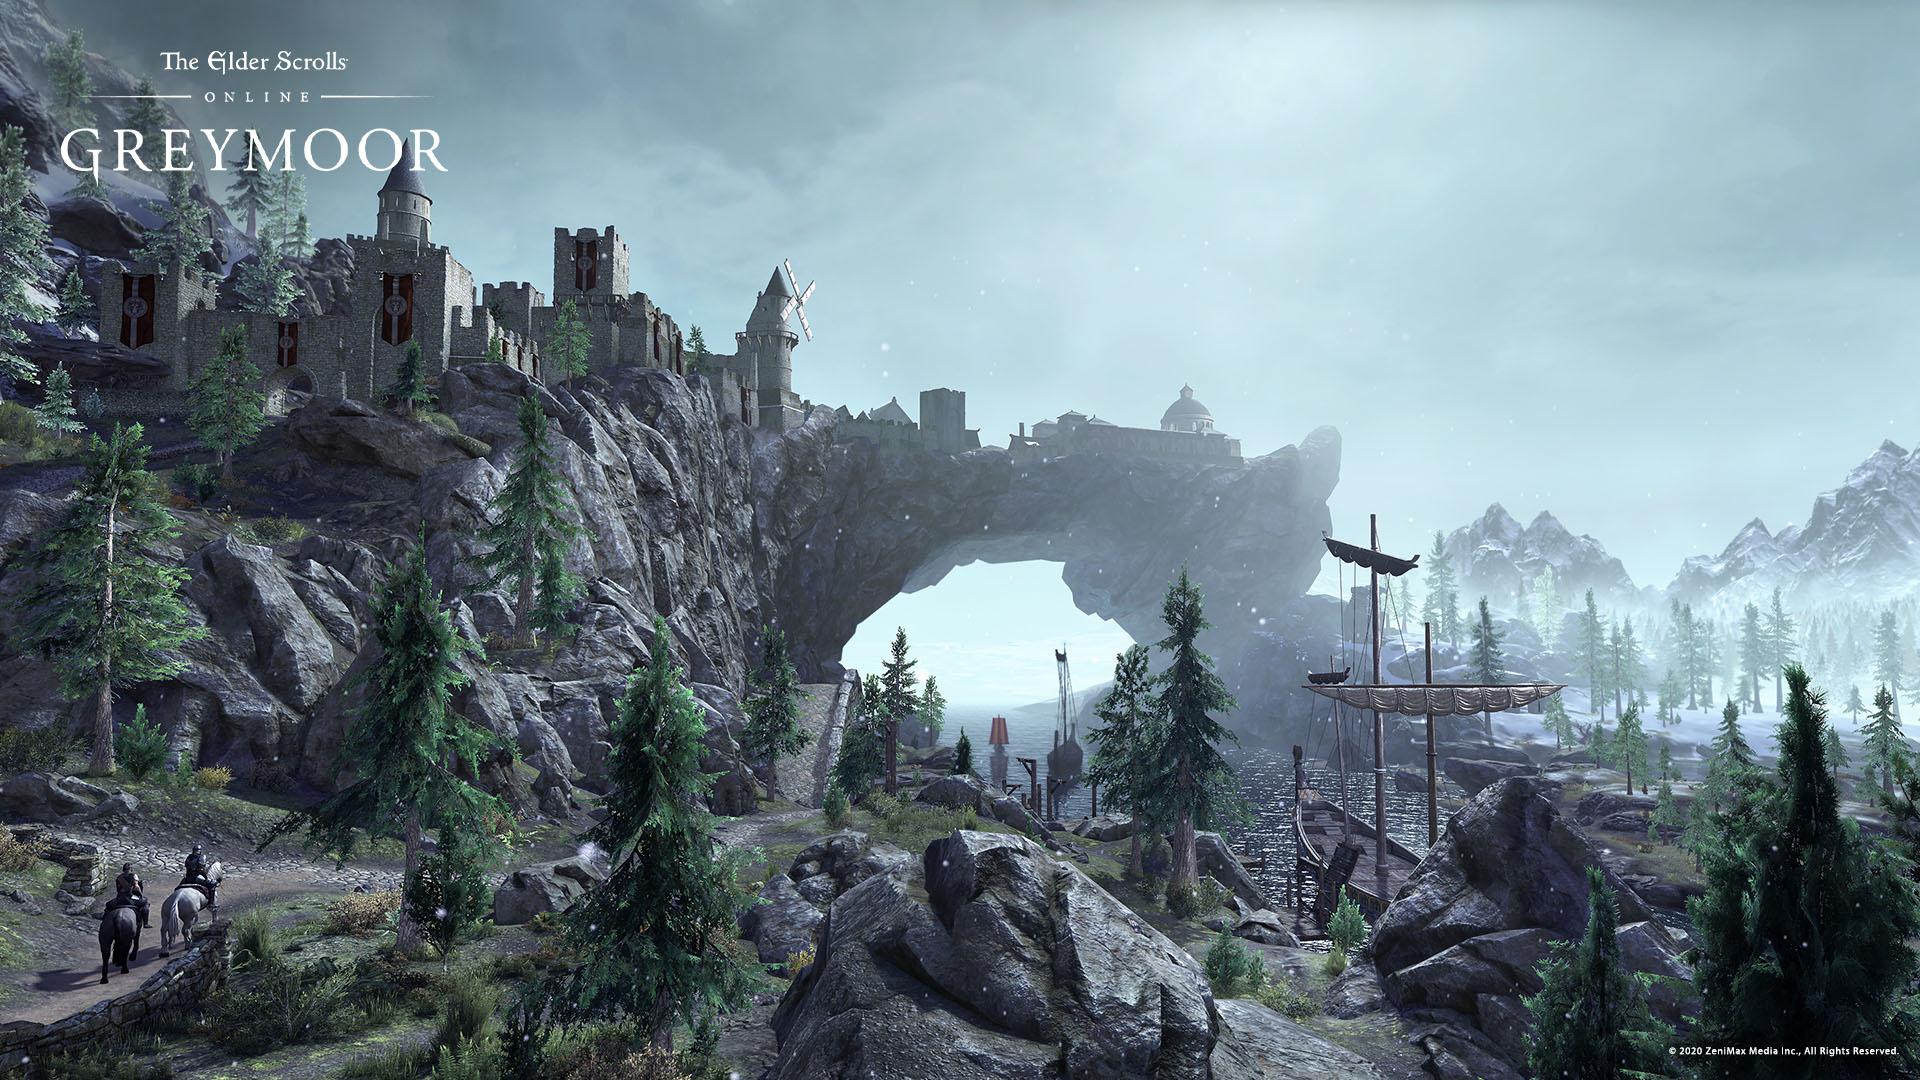 The city of Solitude in TESO: The Dark Heart of Skyrim